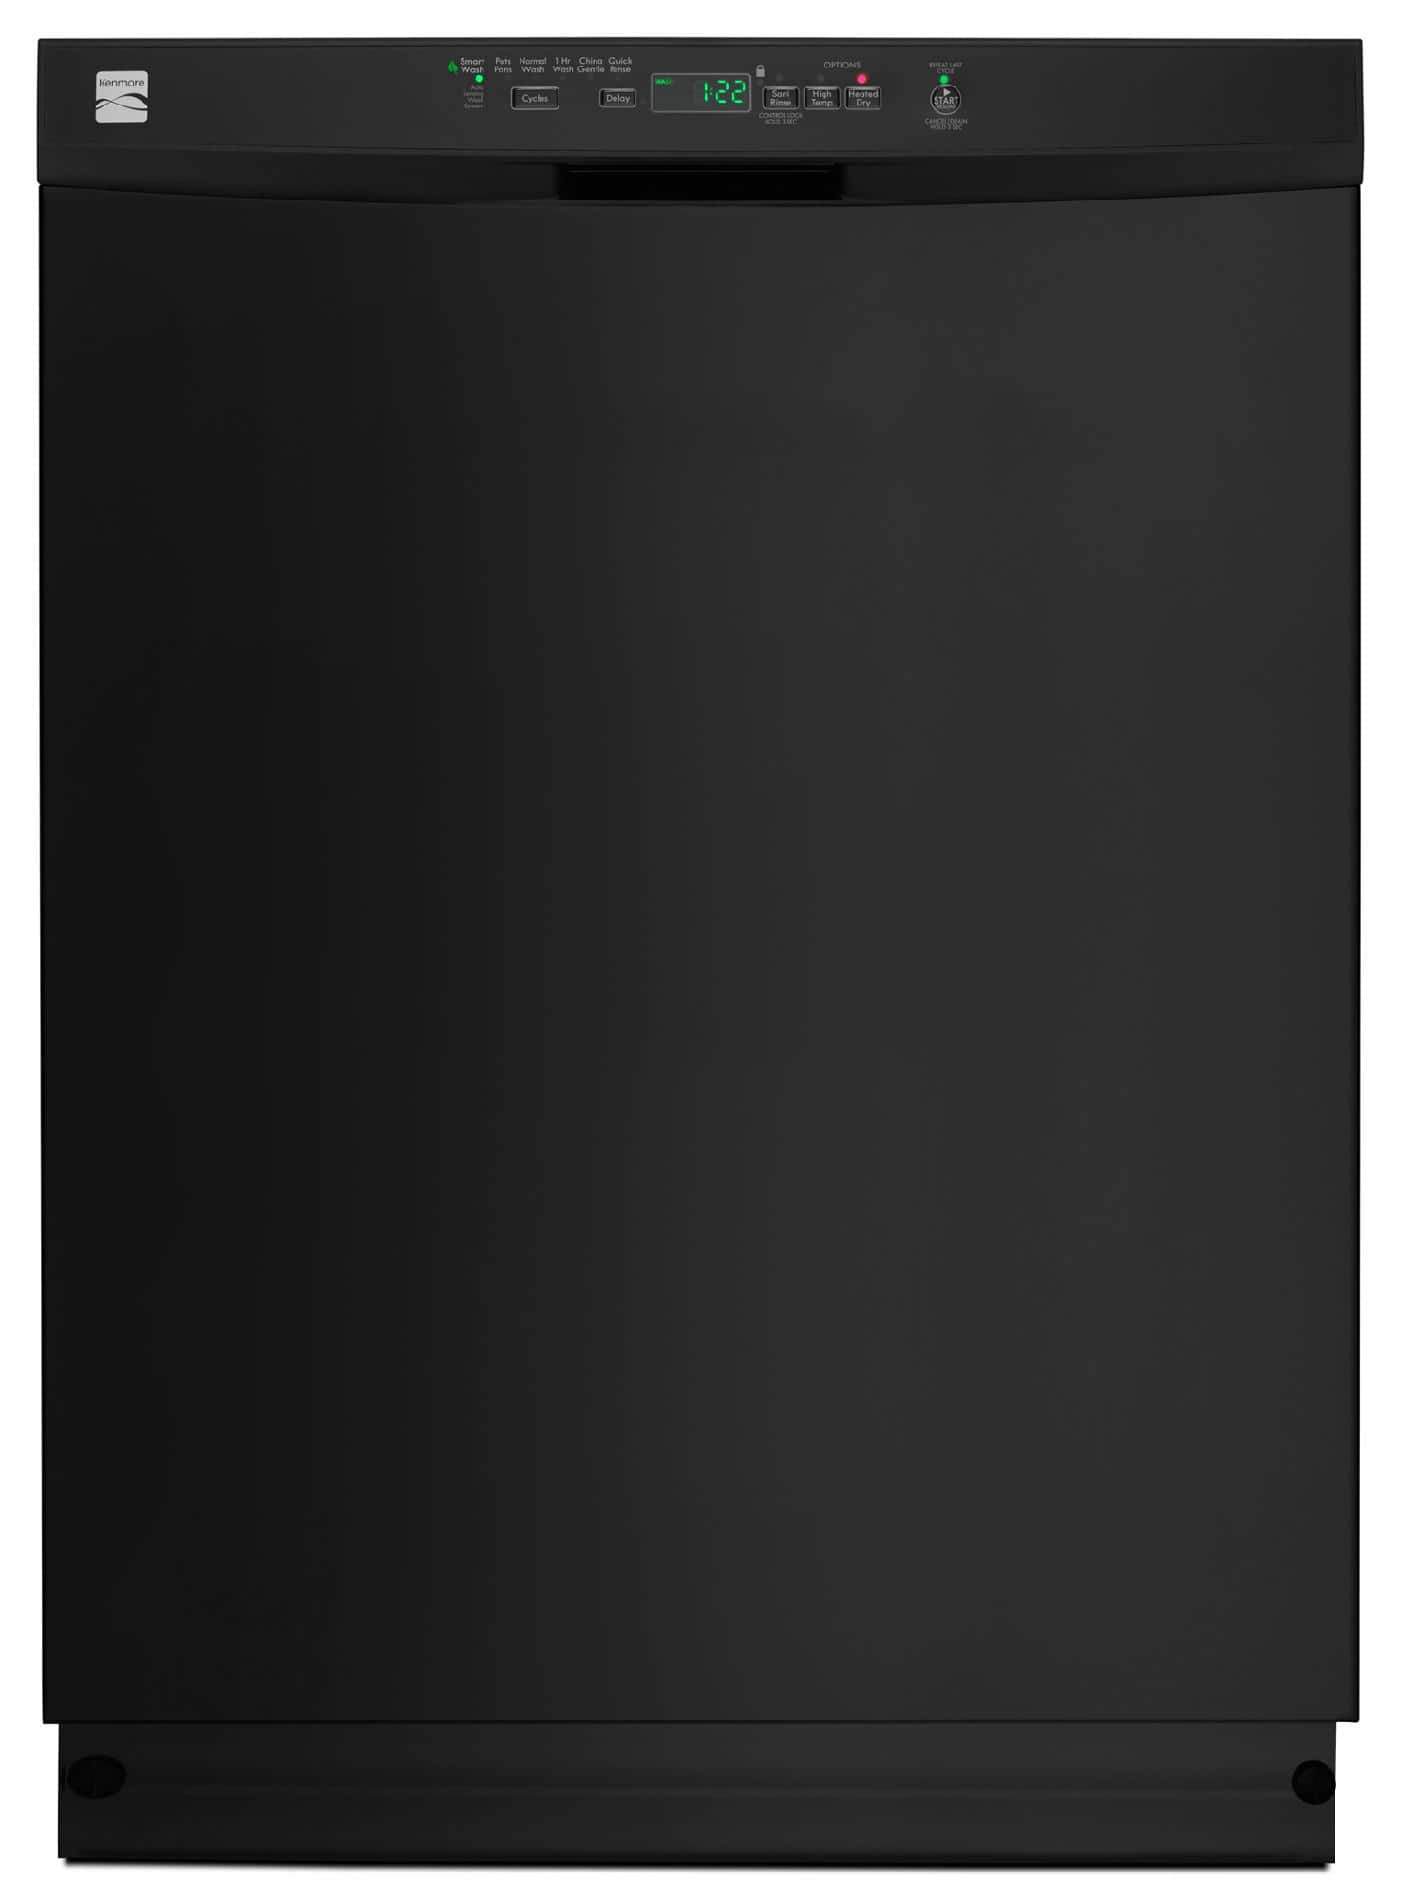 "Kenmore 24"" Built-In Dishwasher w/ PowerWave Spray Arm (Black) $347.49 + ~$52 in SYW Points + Free Store Pickup ~ Sears *YMMV*"